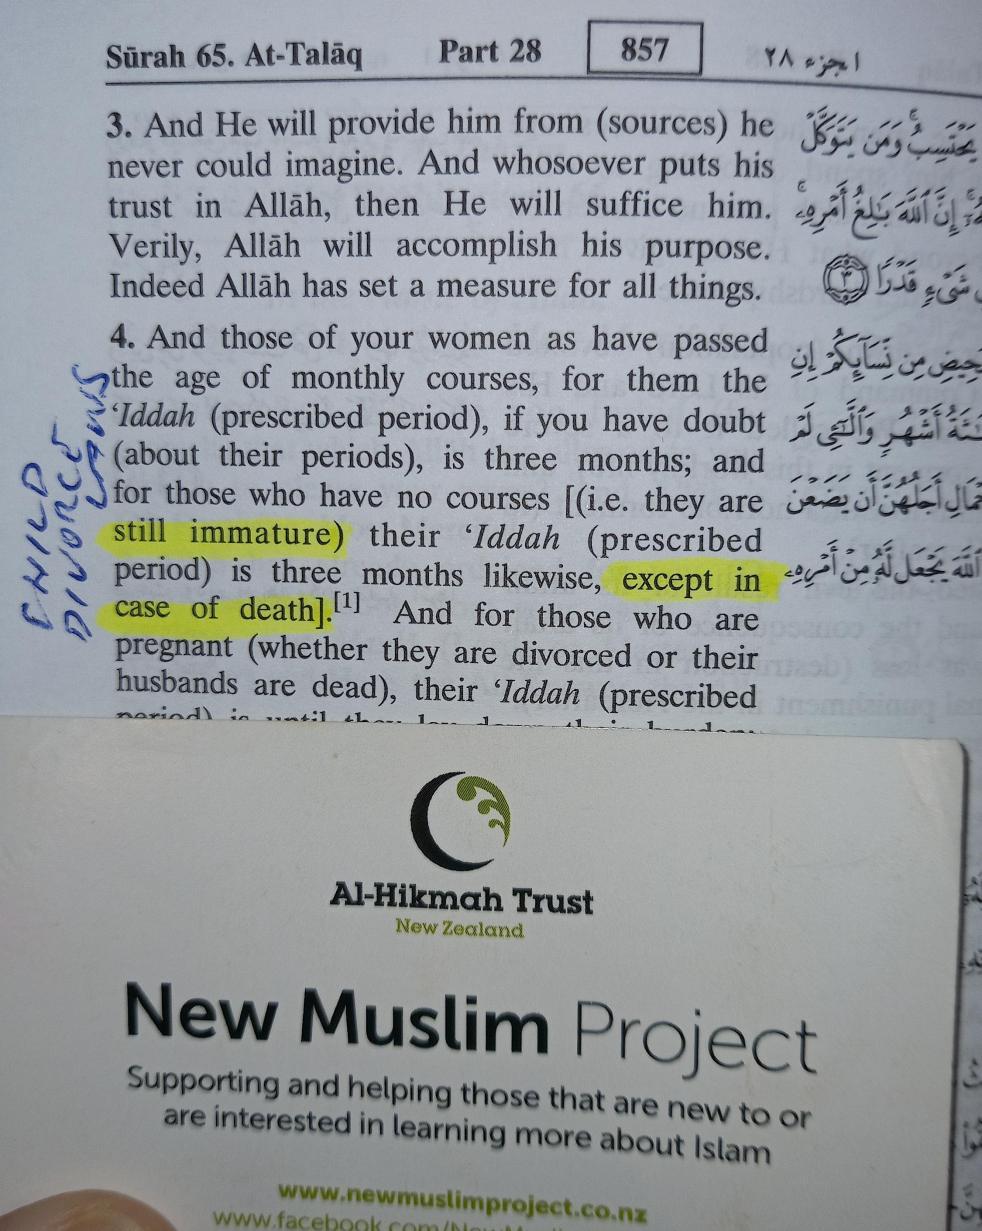 al hikmah trust